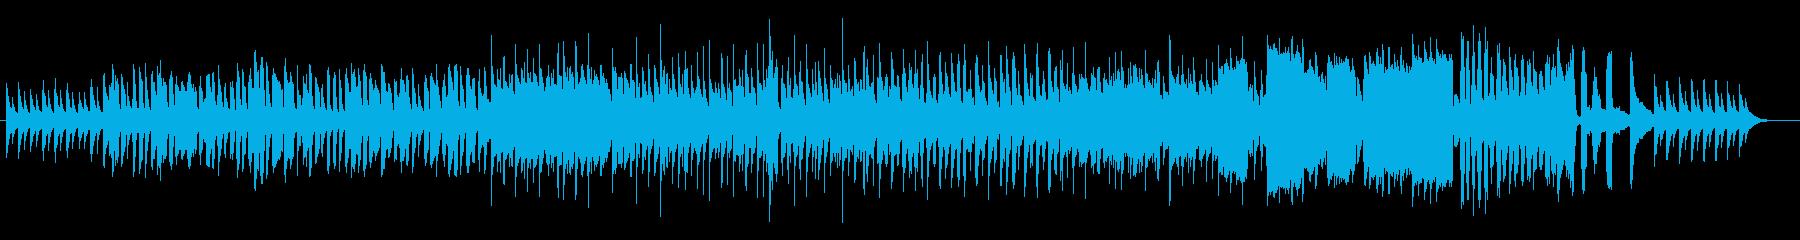 CMで使える子供の行進曲の再生済みの波形